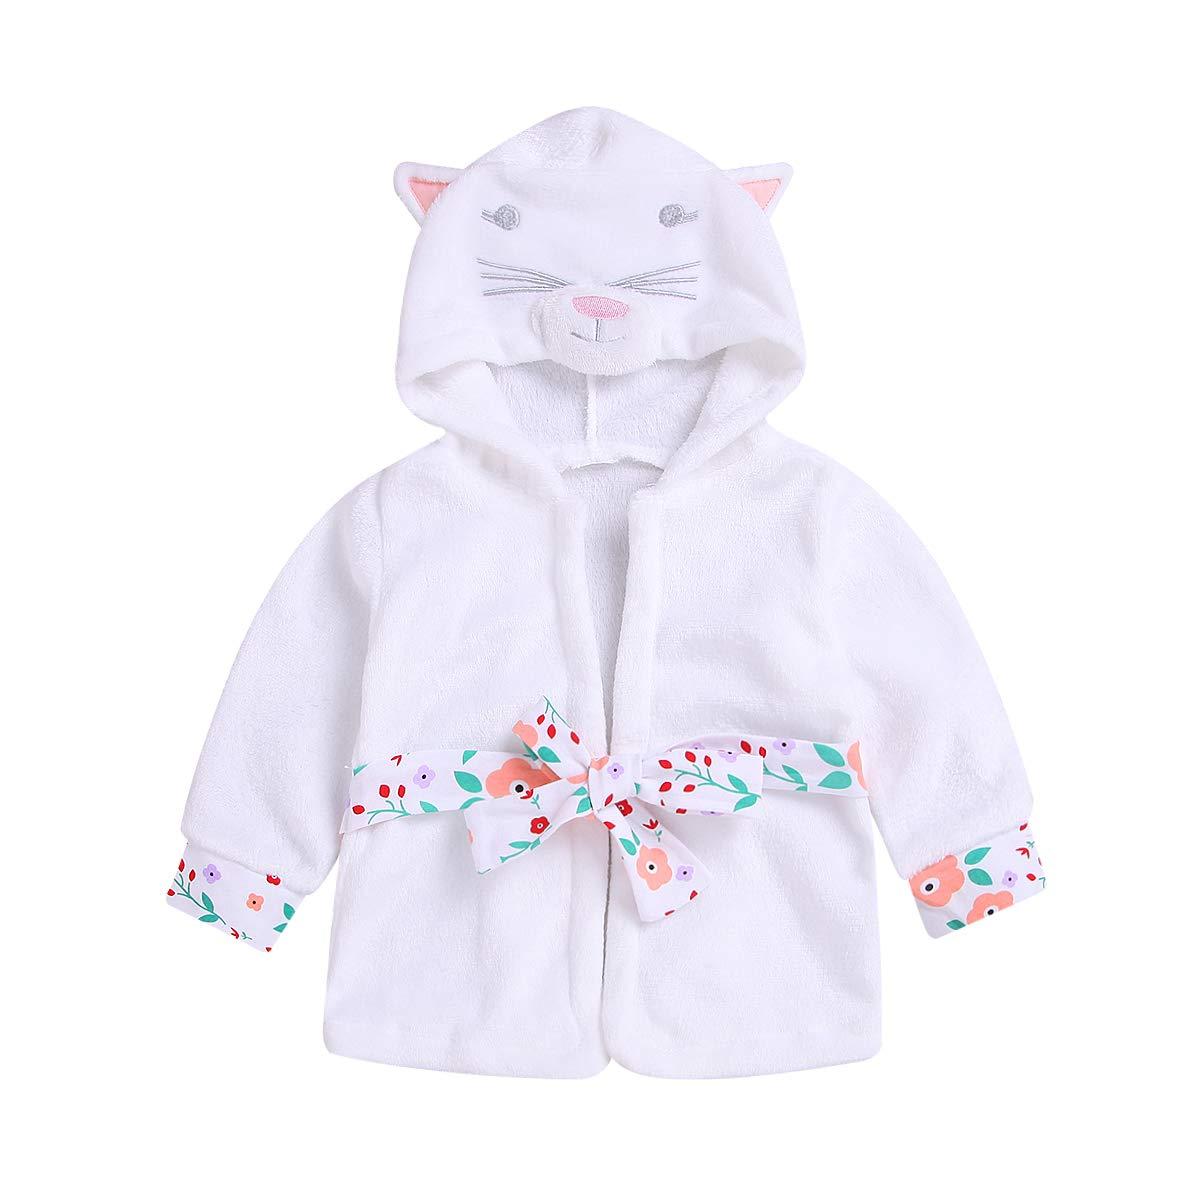 994dc0257e Baby Toddler Girl Coral Fleece Bathrobe Animal Hooded Towel Robe Sleepwear  1-5T product image